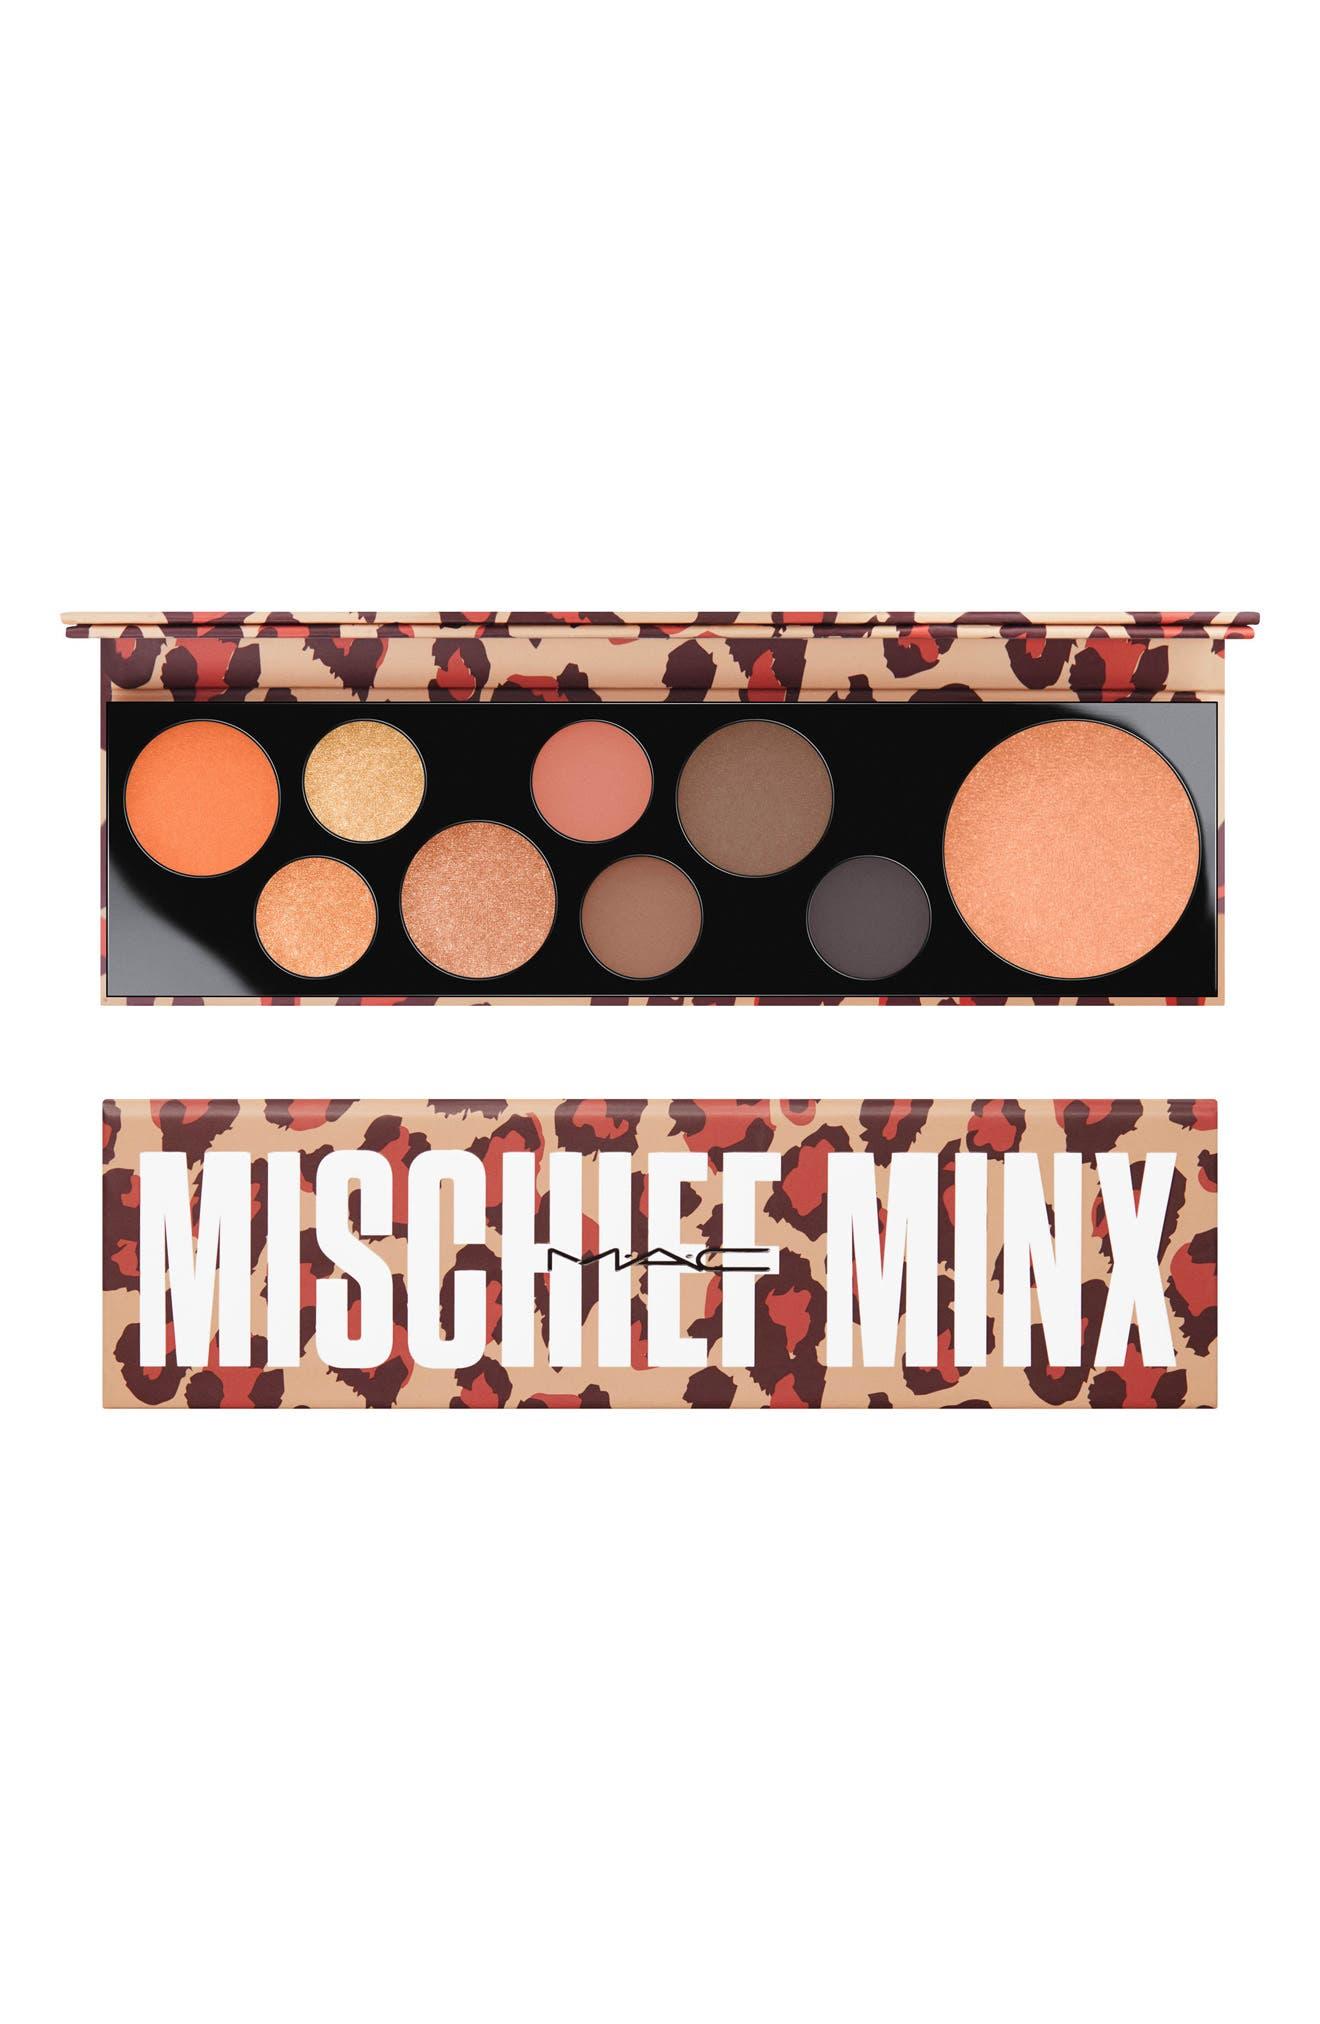 Alternate Image 1 Selected - MAC Girls Mischief Minx Palette ($160 Value)